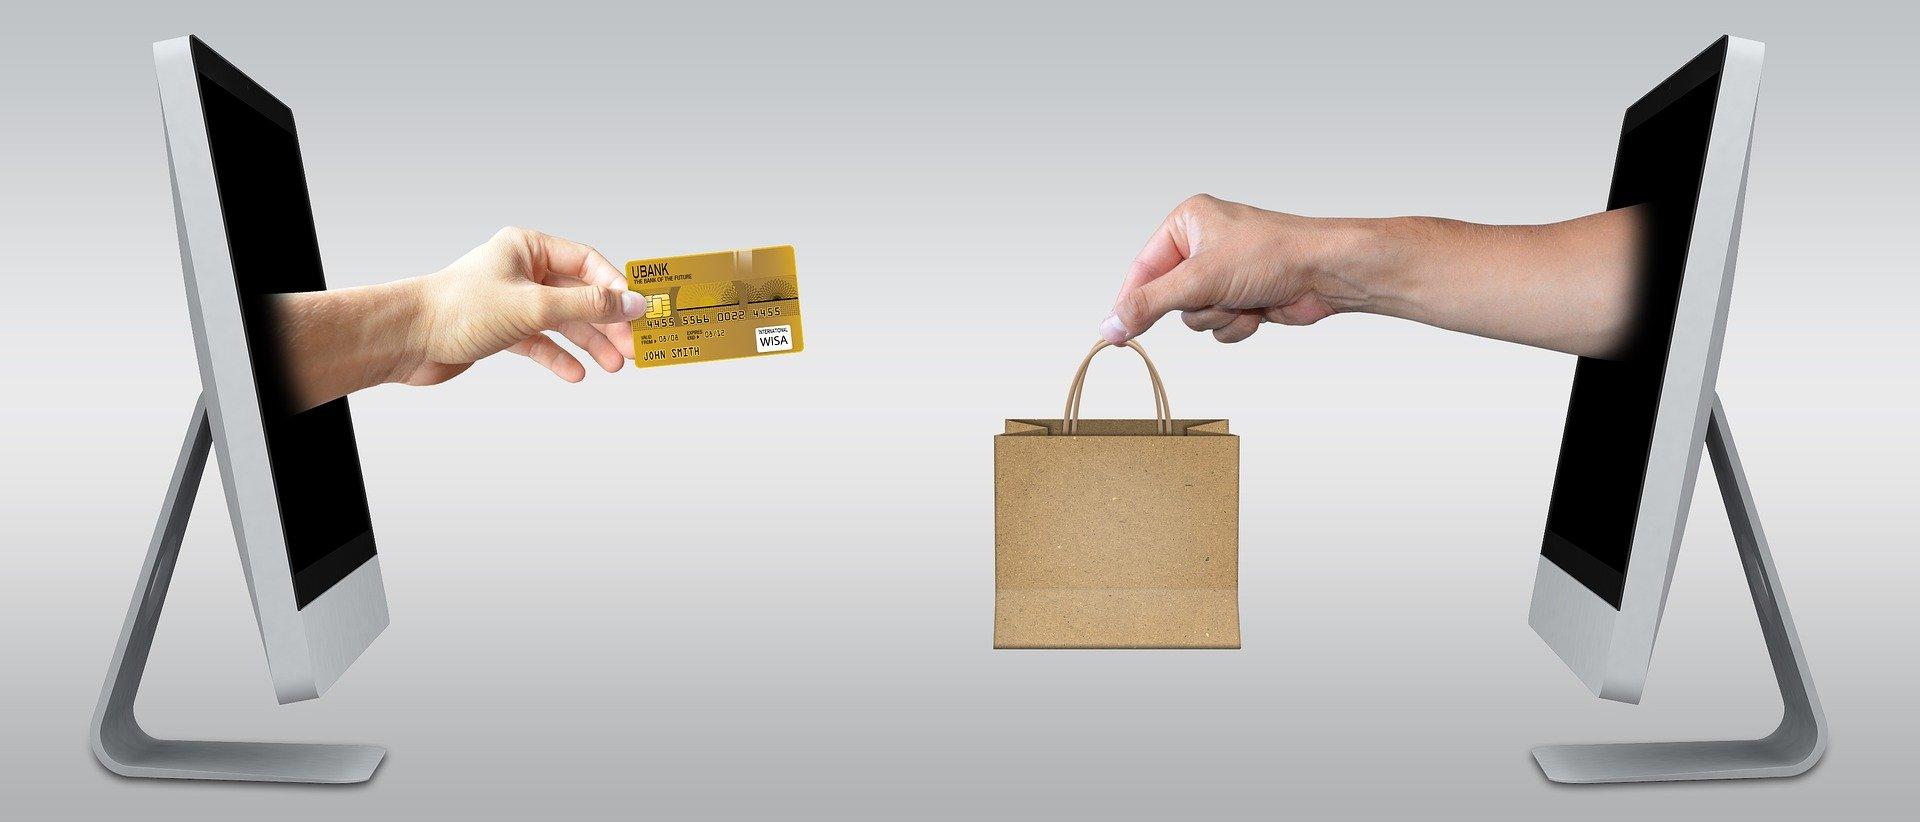 recibir-pagos-de-clientes-online-flexio-2